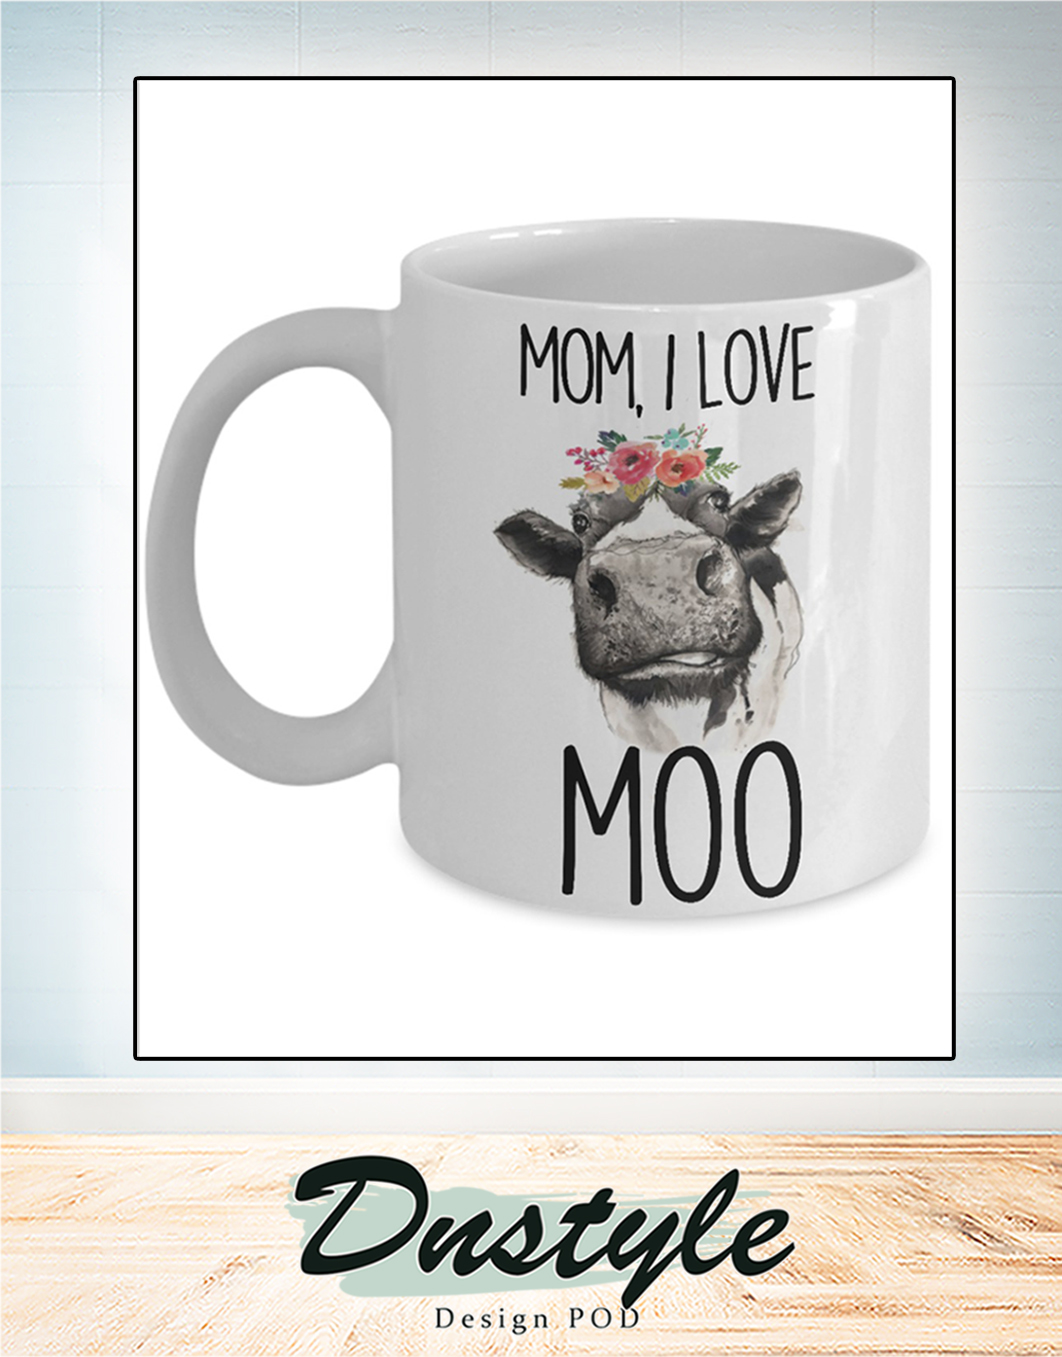 Cow Mom I love moo mug 2